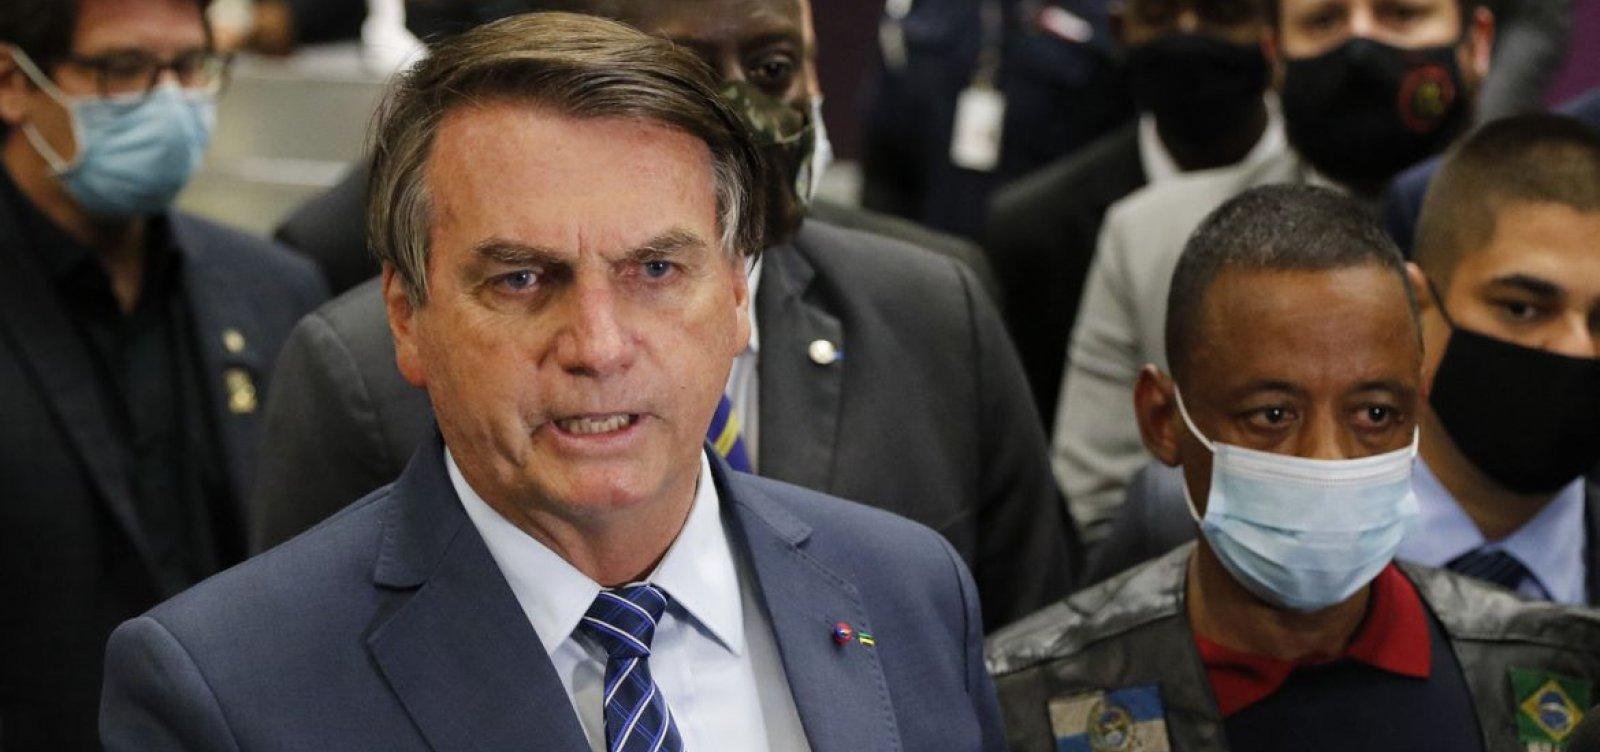 OAB enviou à CPI da Covid denúncia contra Bolsonaro por genocídio indígena